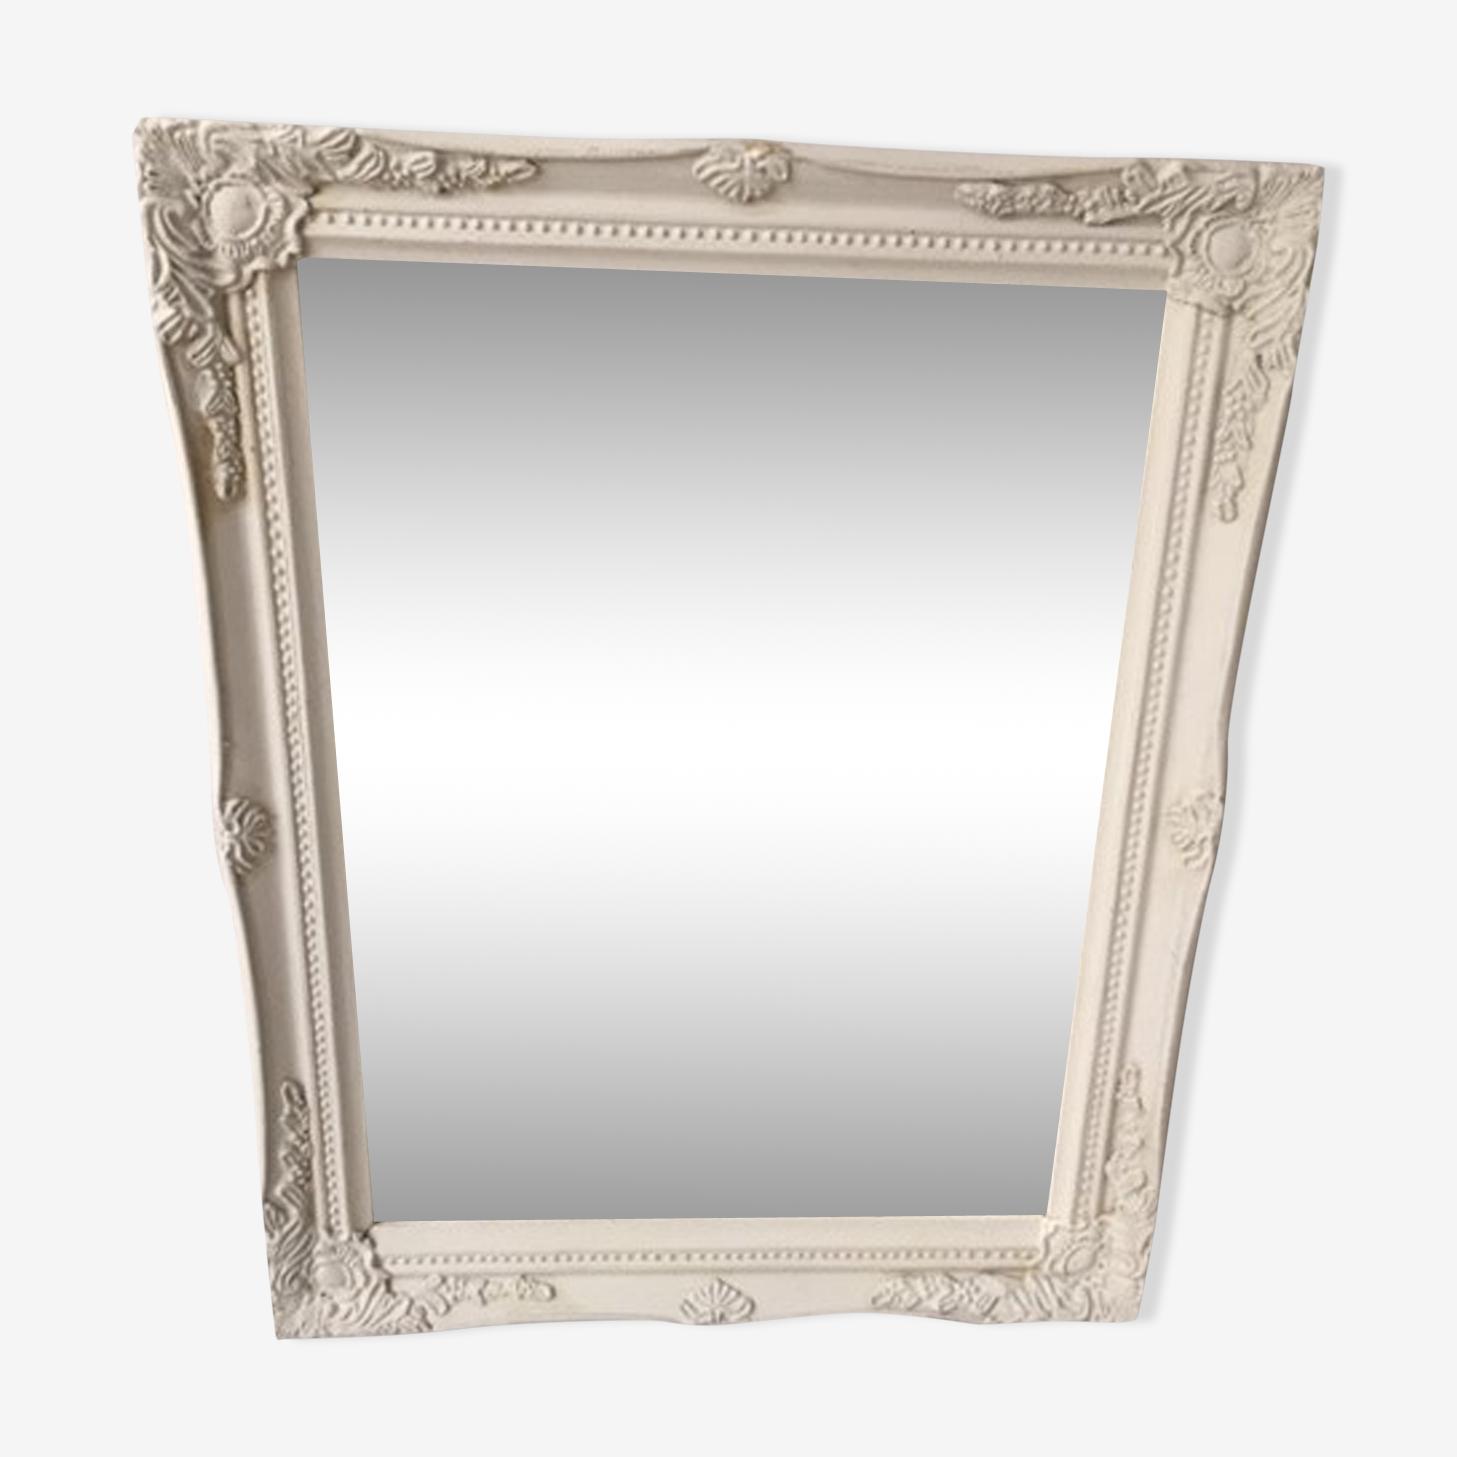 Rectangular mirror white wood 46x36cm